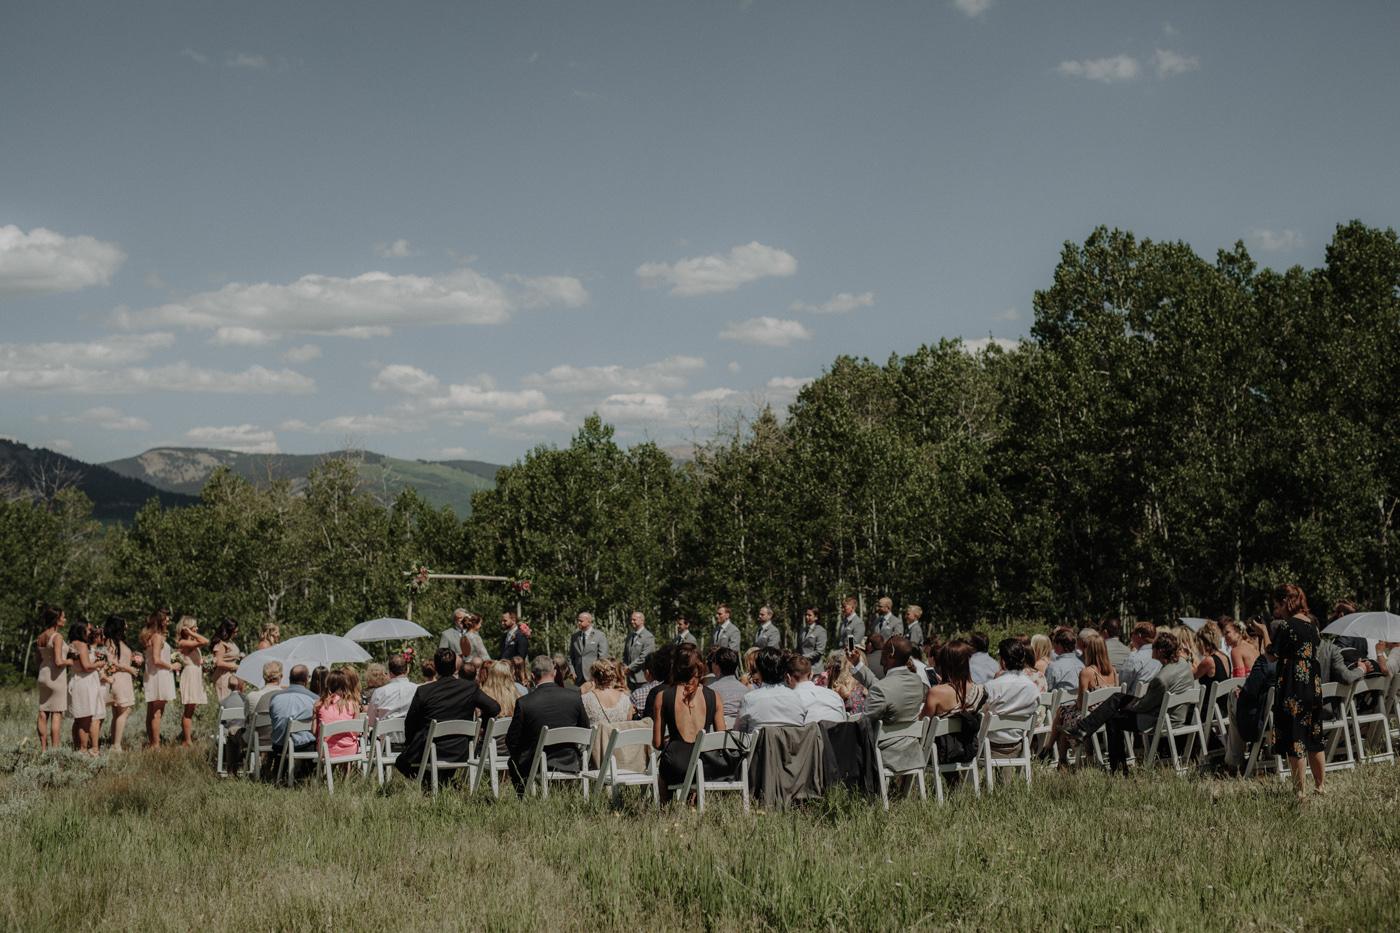 woods-walk-trail-crested-butte-colorado-wedding-40.jpg